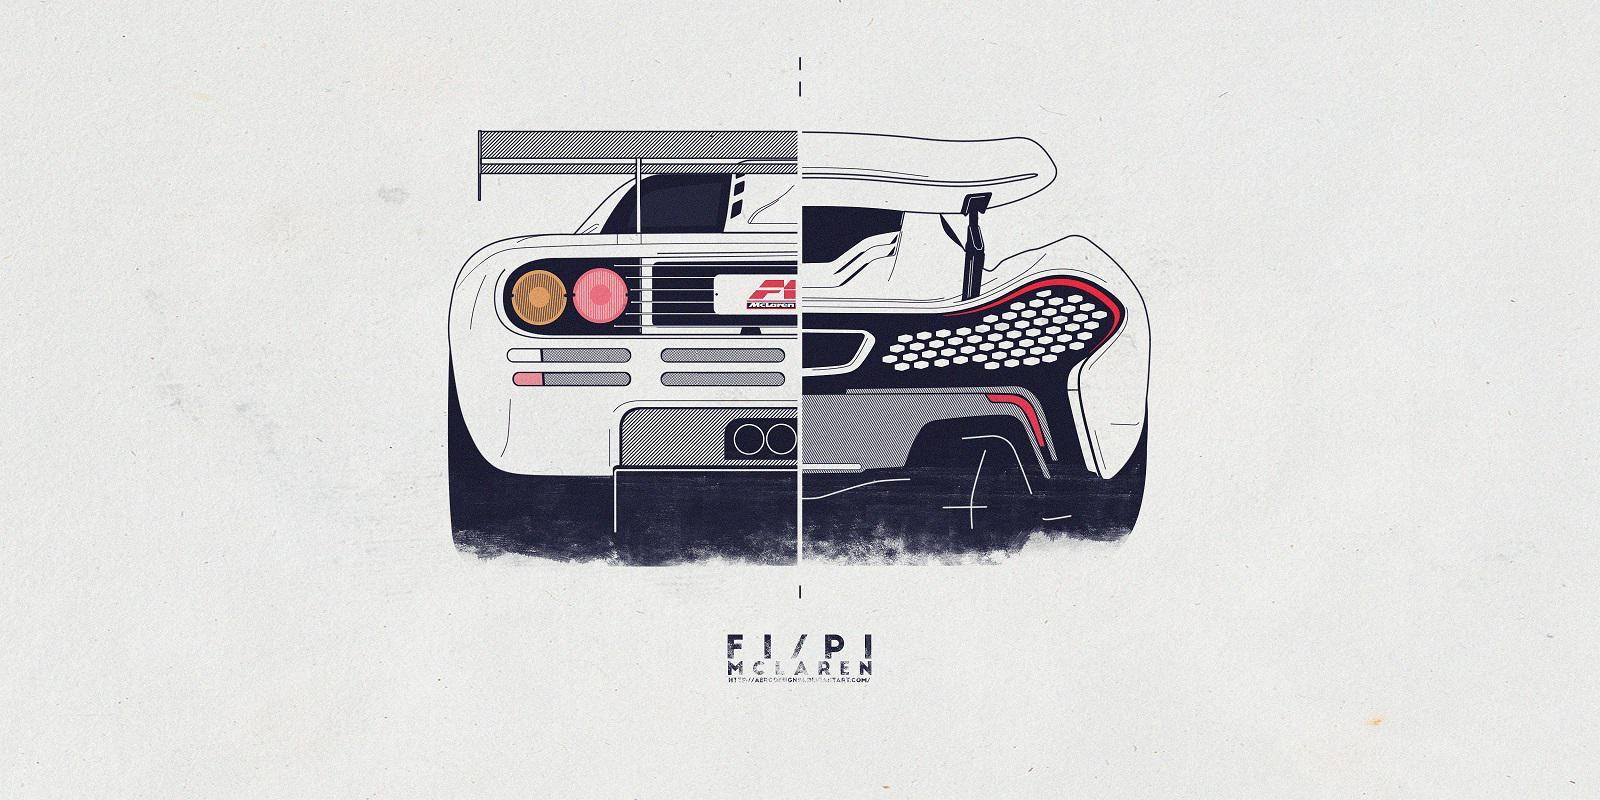 #McLarenMonday By Aero Design /dA http://t.co/Ip4EUeCihz